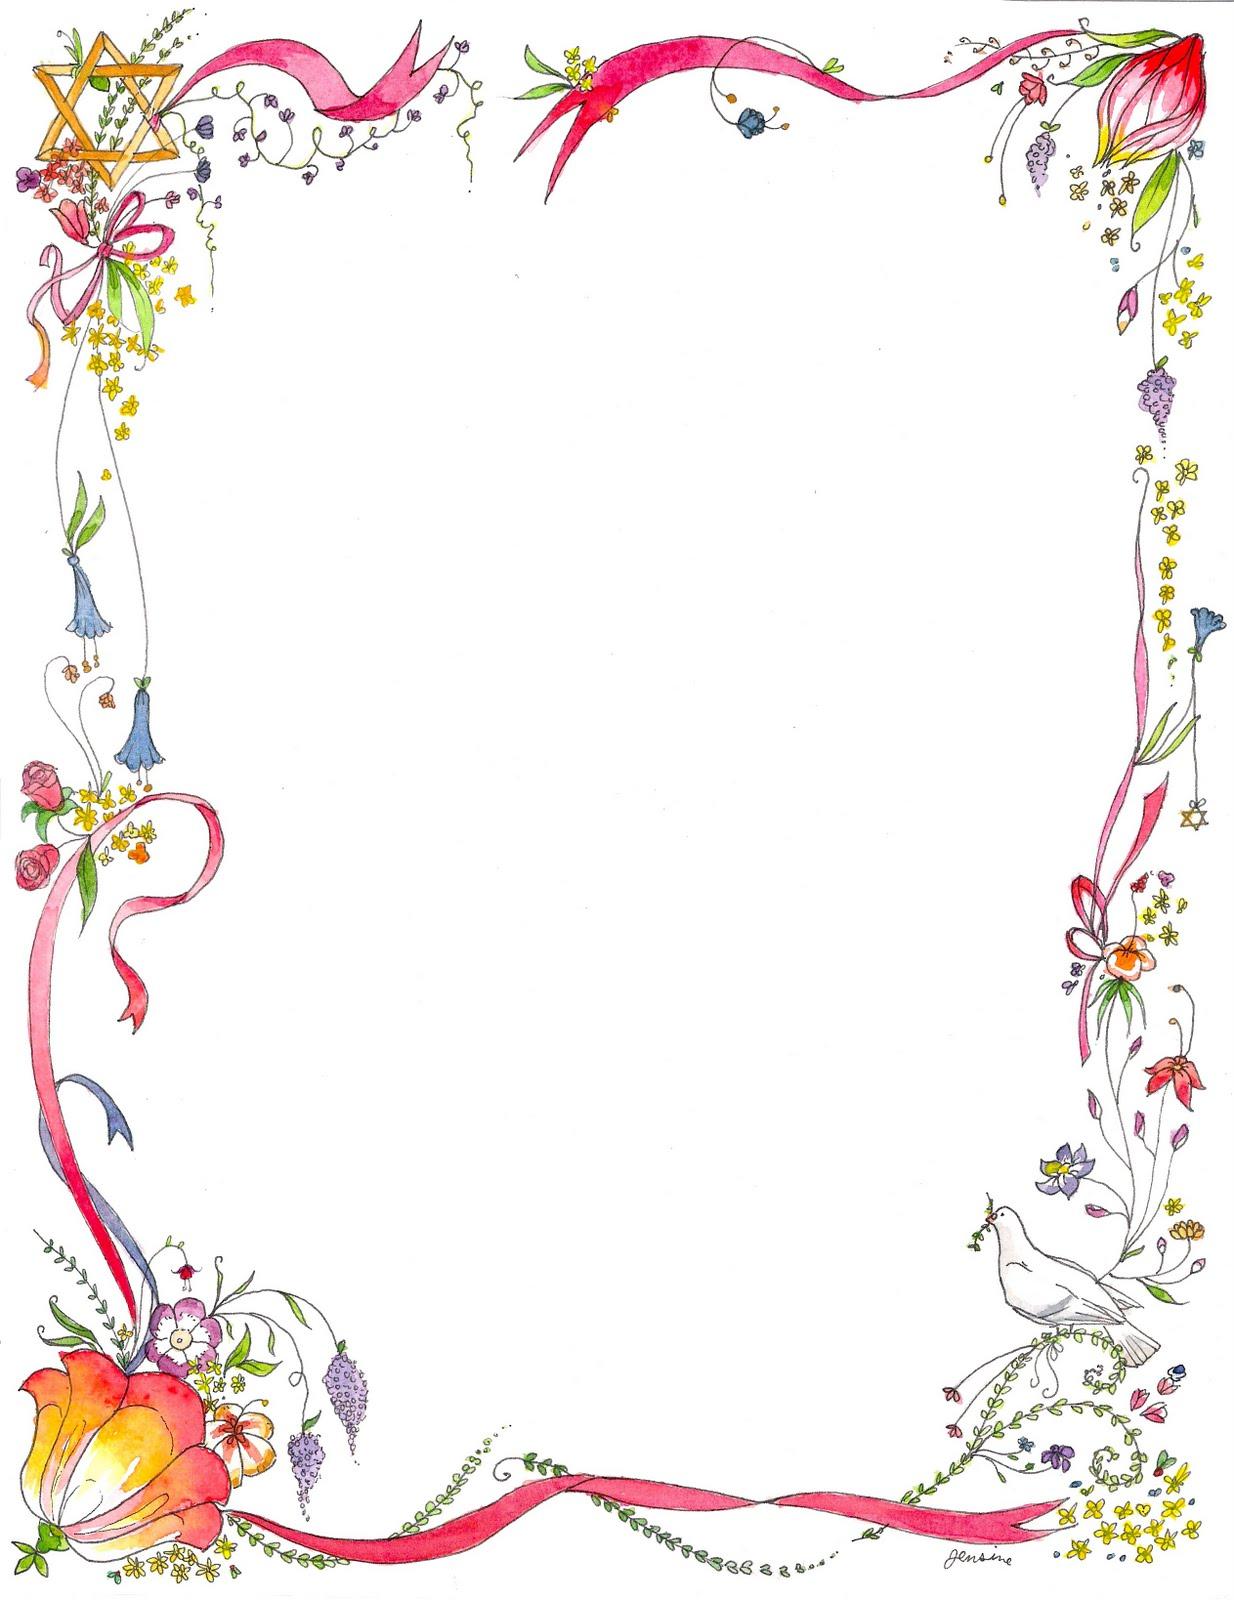 Hd Border Design Image Flowers Desktop Wallpaper Clip Art Library